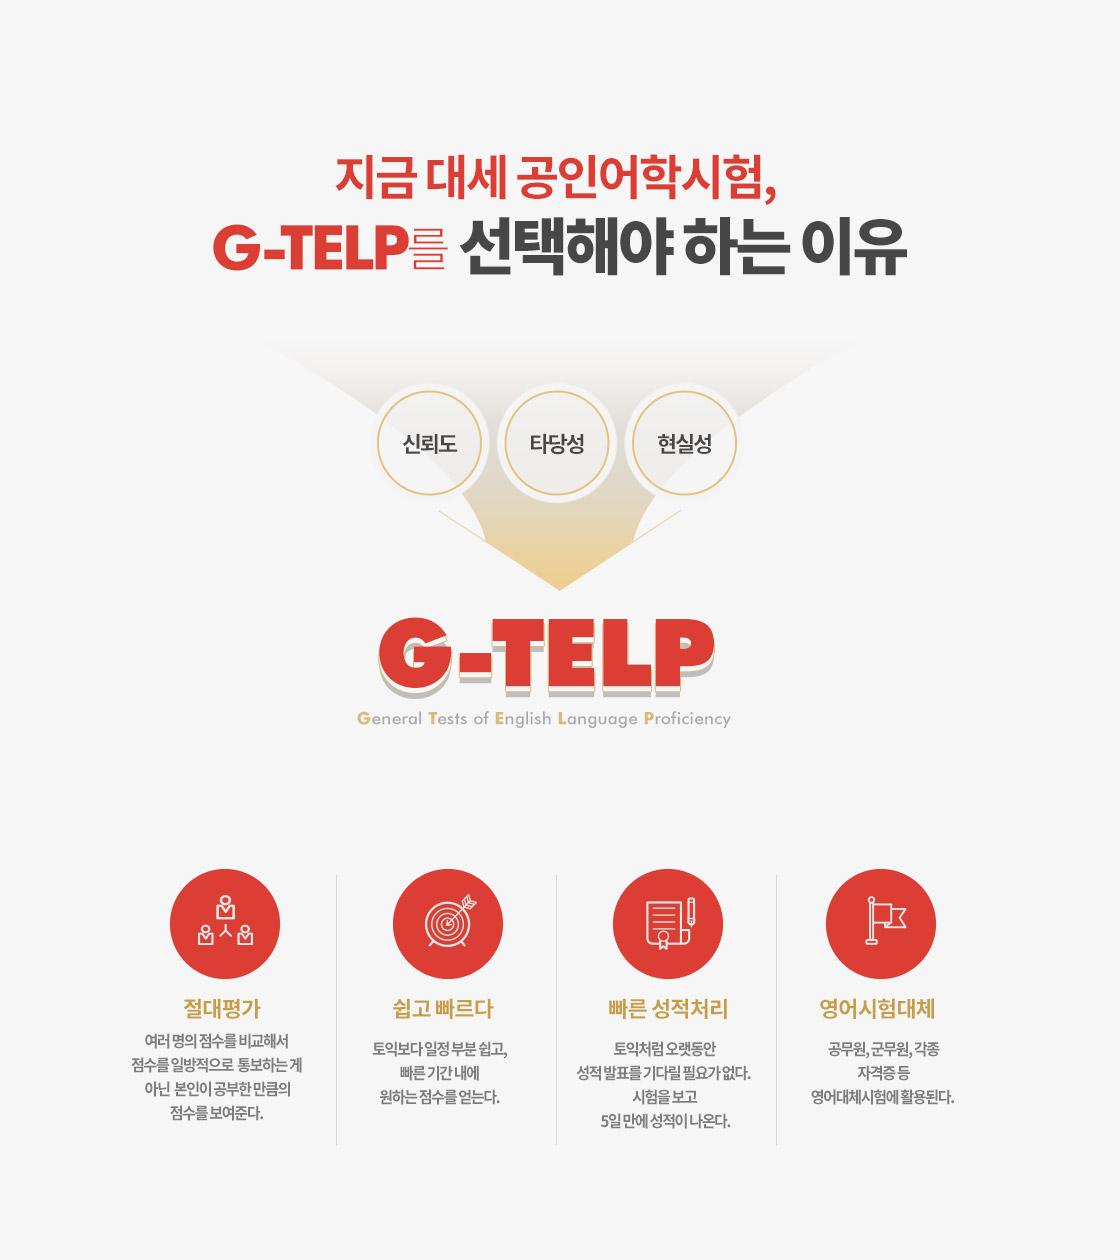 g-telp를 선택해야하는 이유